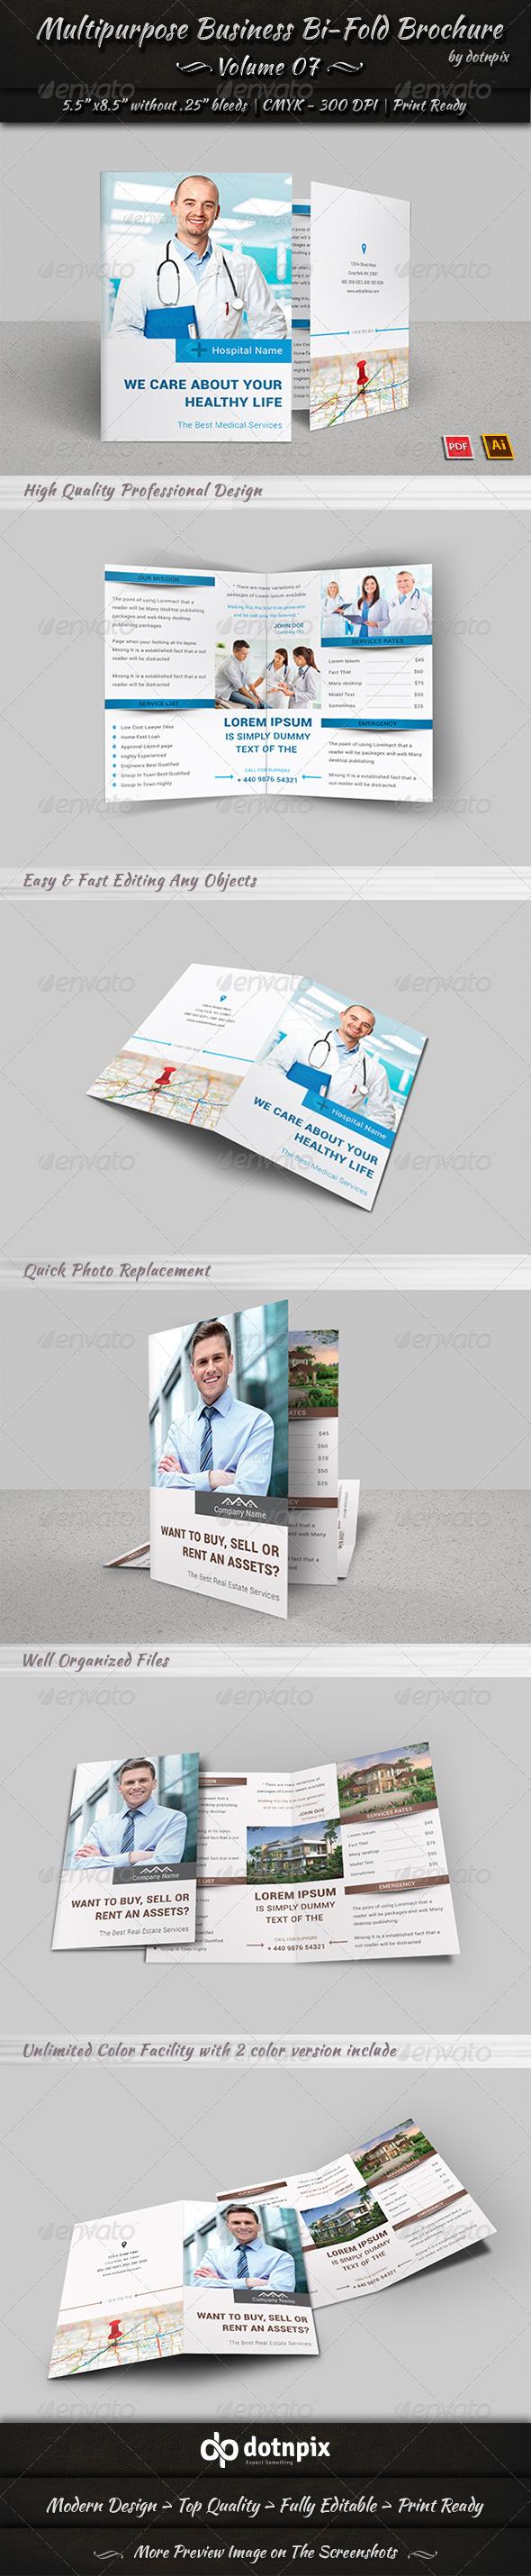 GraphicRiver Multipurpose Business Bi-Fold Brochure Volume 7 7973334